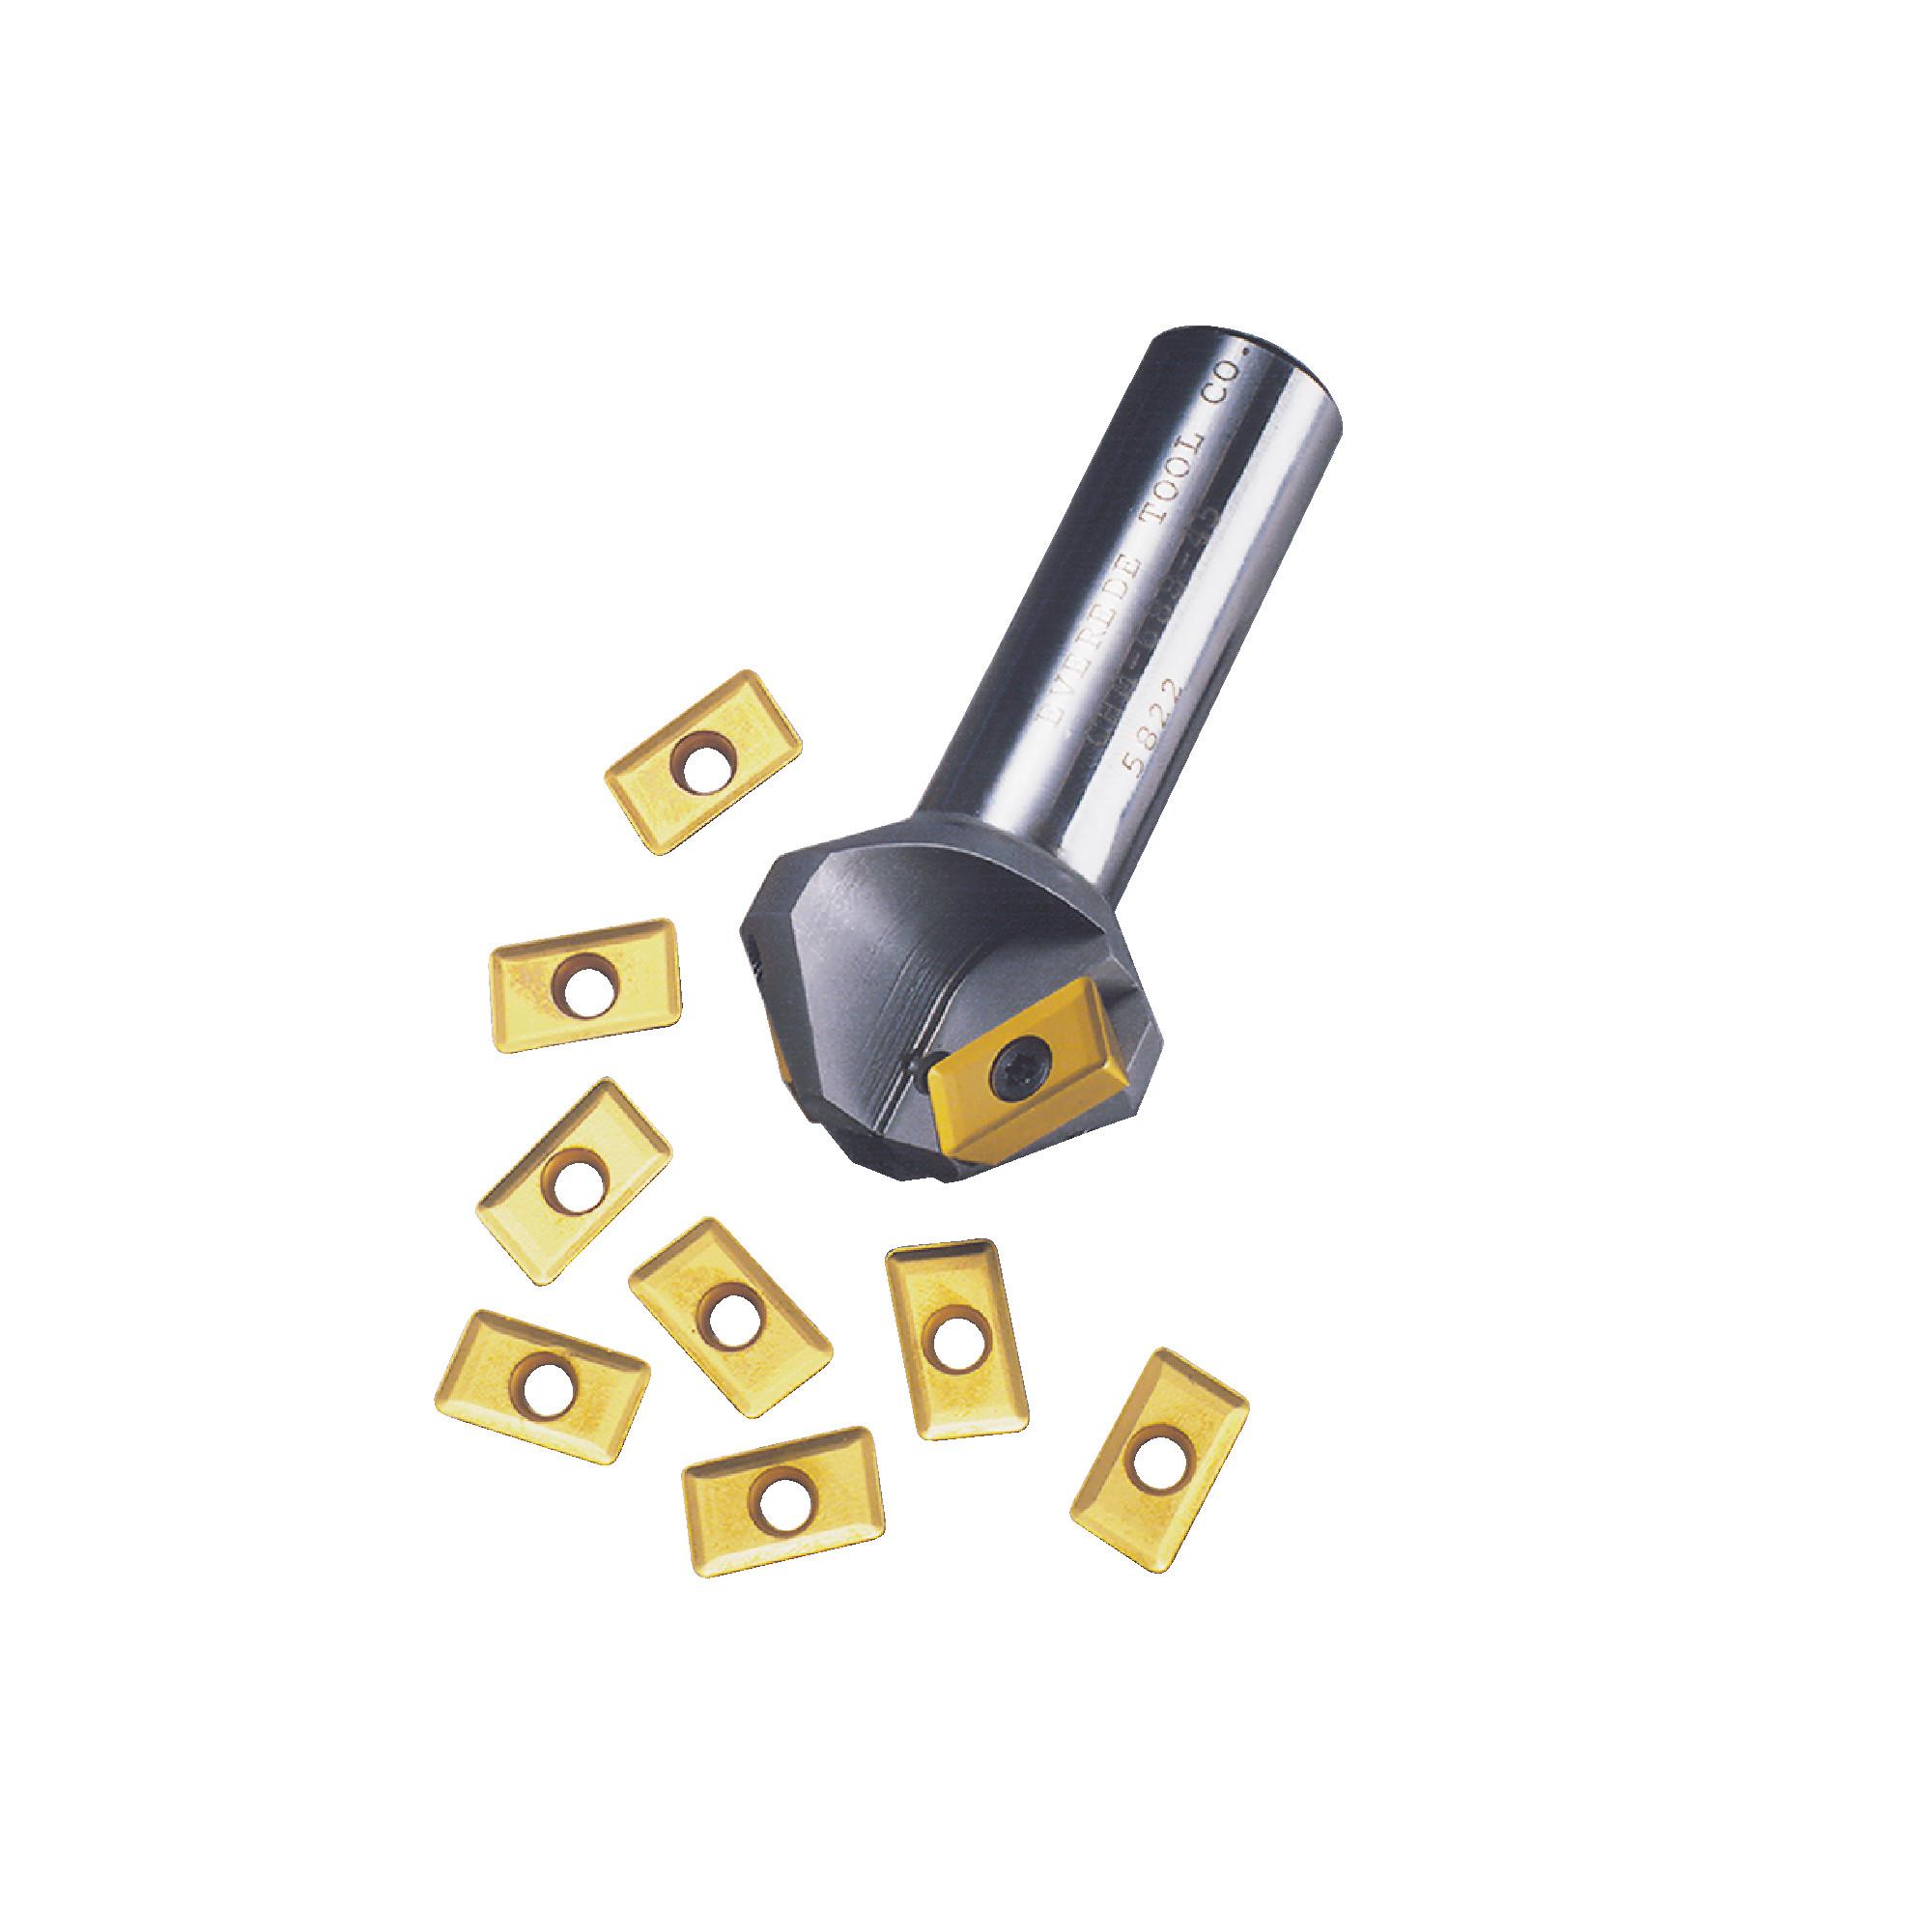 EVEREDE - CHM-1.000-30 / 30° Countersink & Chamfering Holder / APLT347